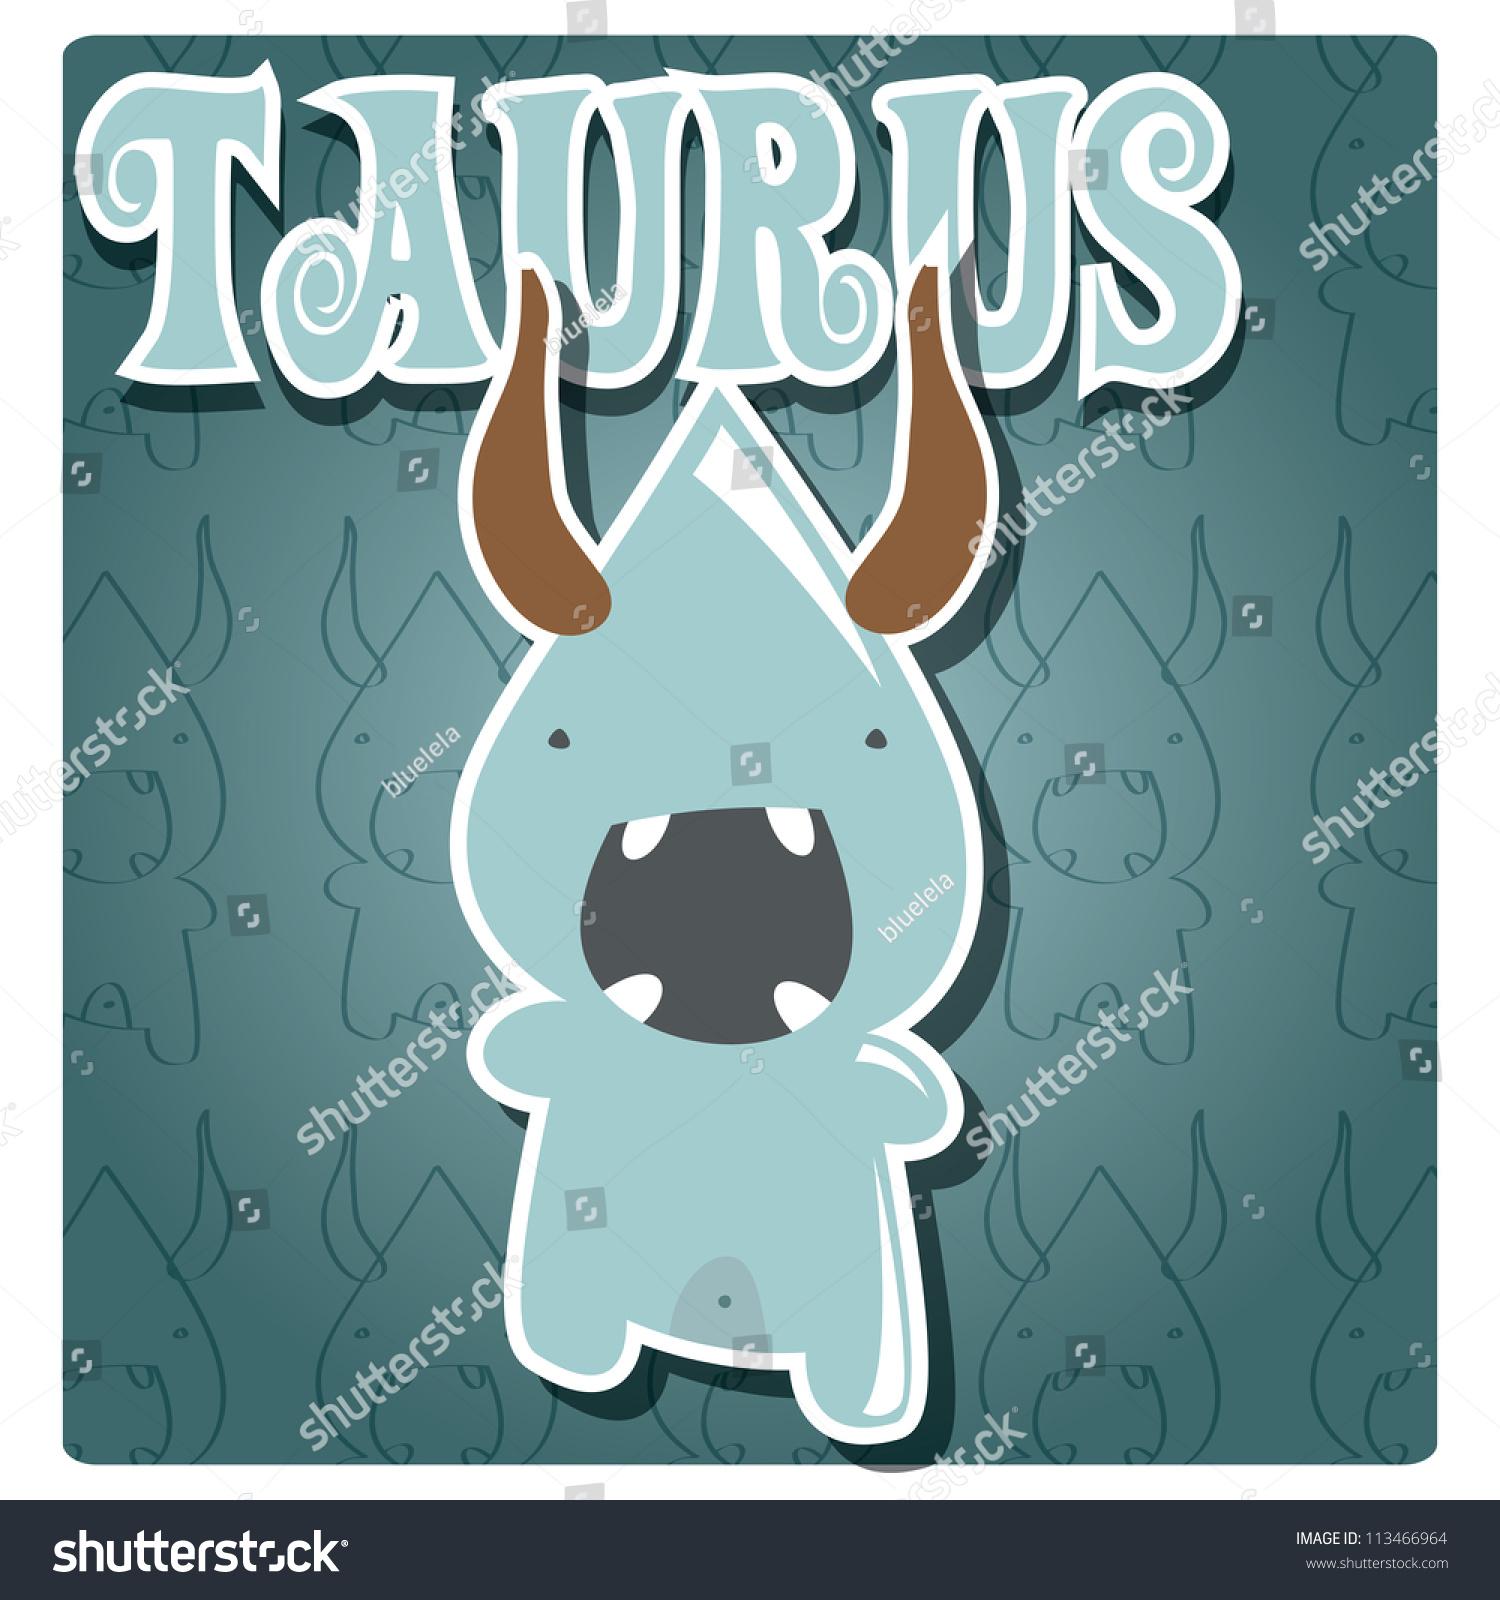 Zodiac Sign Taurus Stock Vector Zodiac Sign Taurus With Cute Colorful